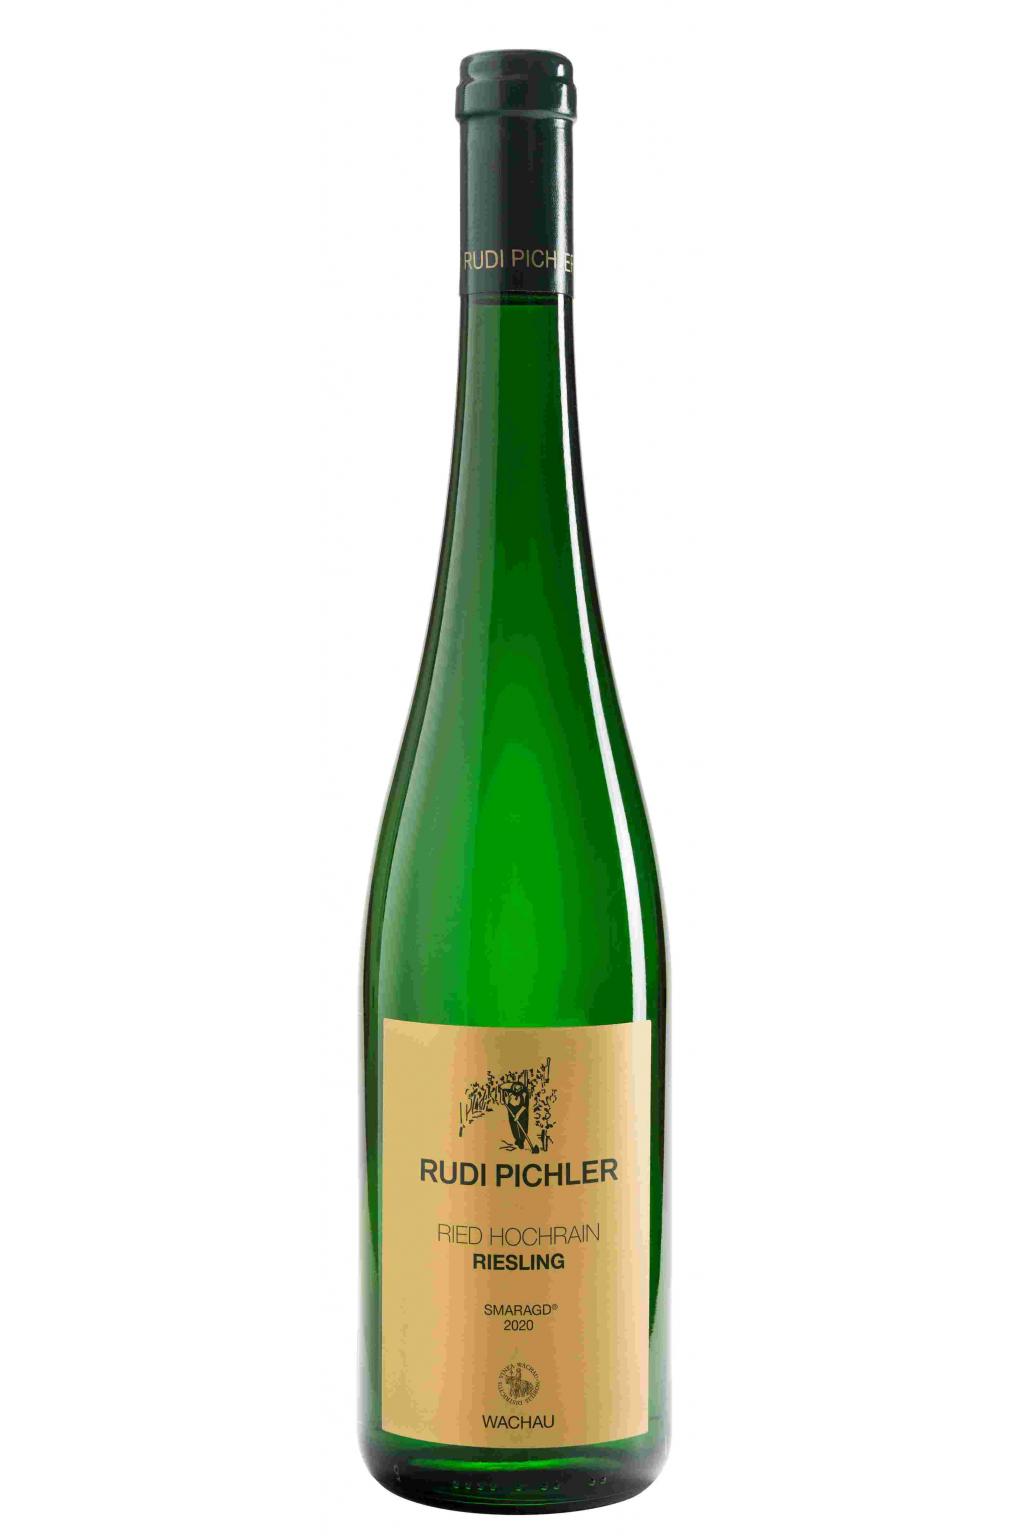 RudiPichler Riesling Ried Hochrain Smaragd 2020 web